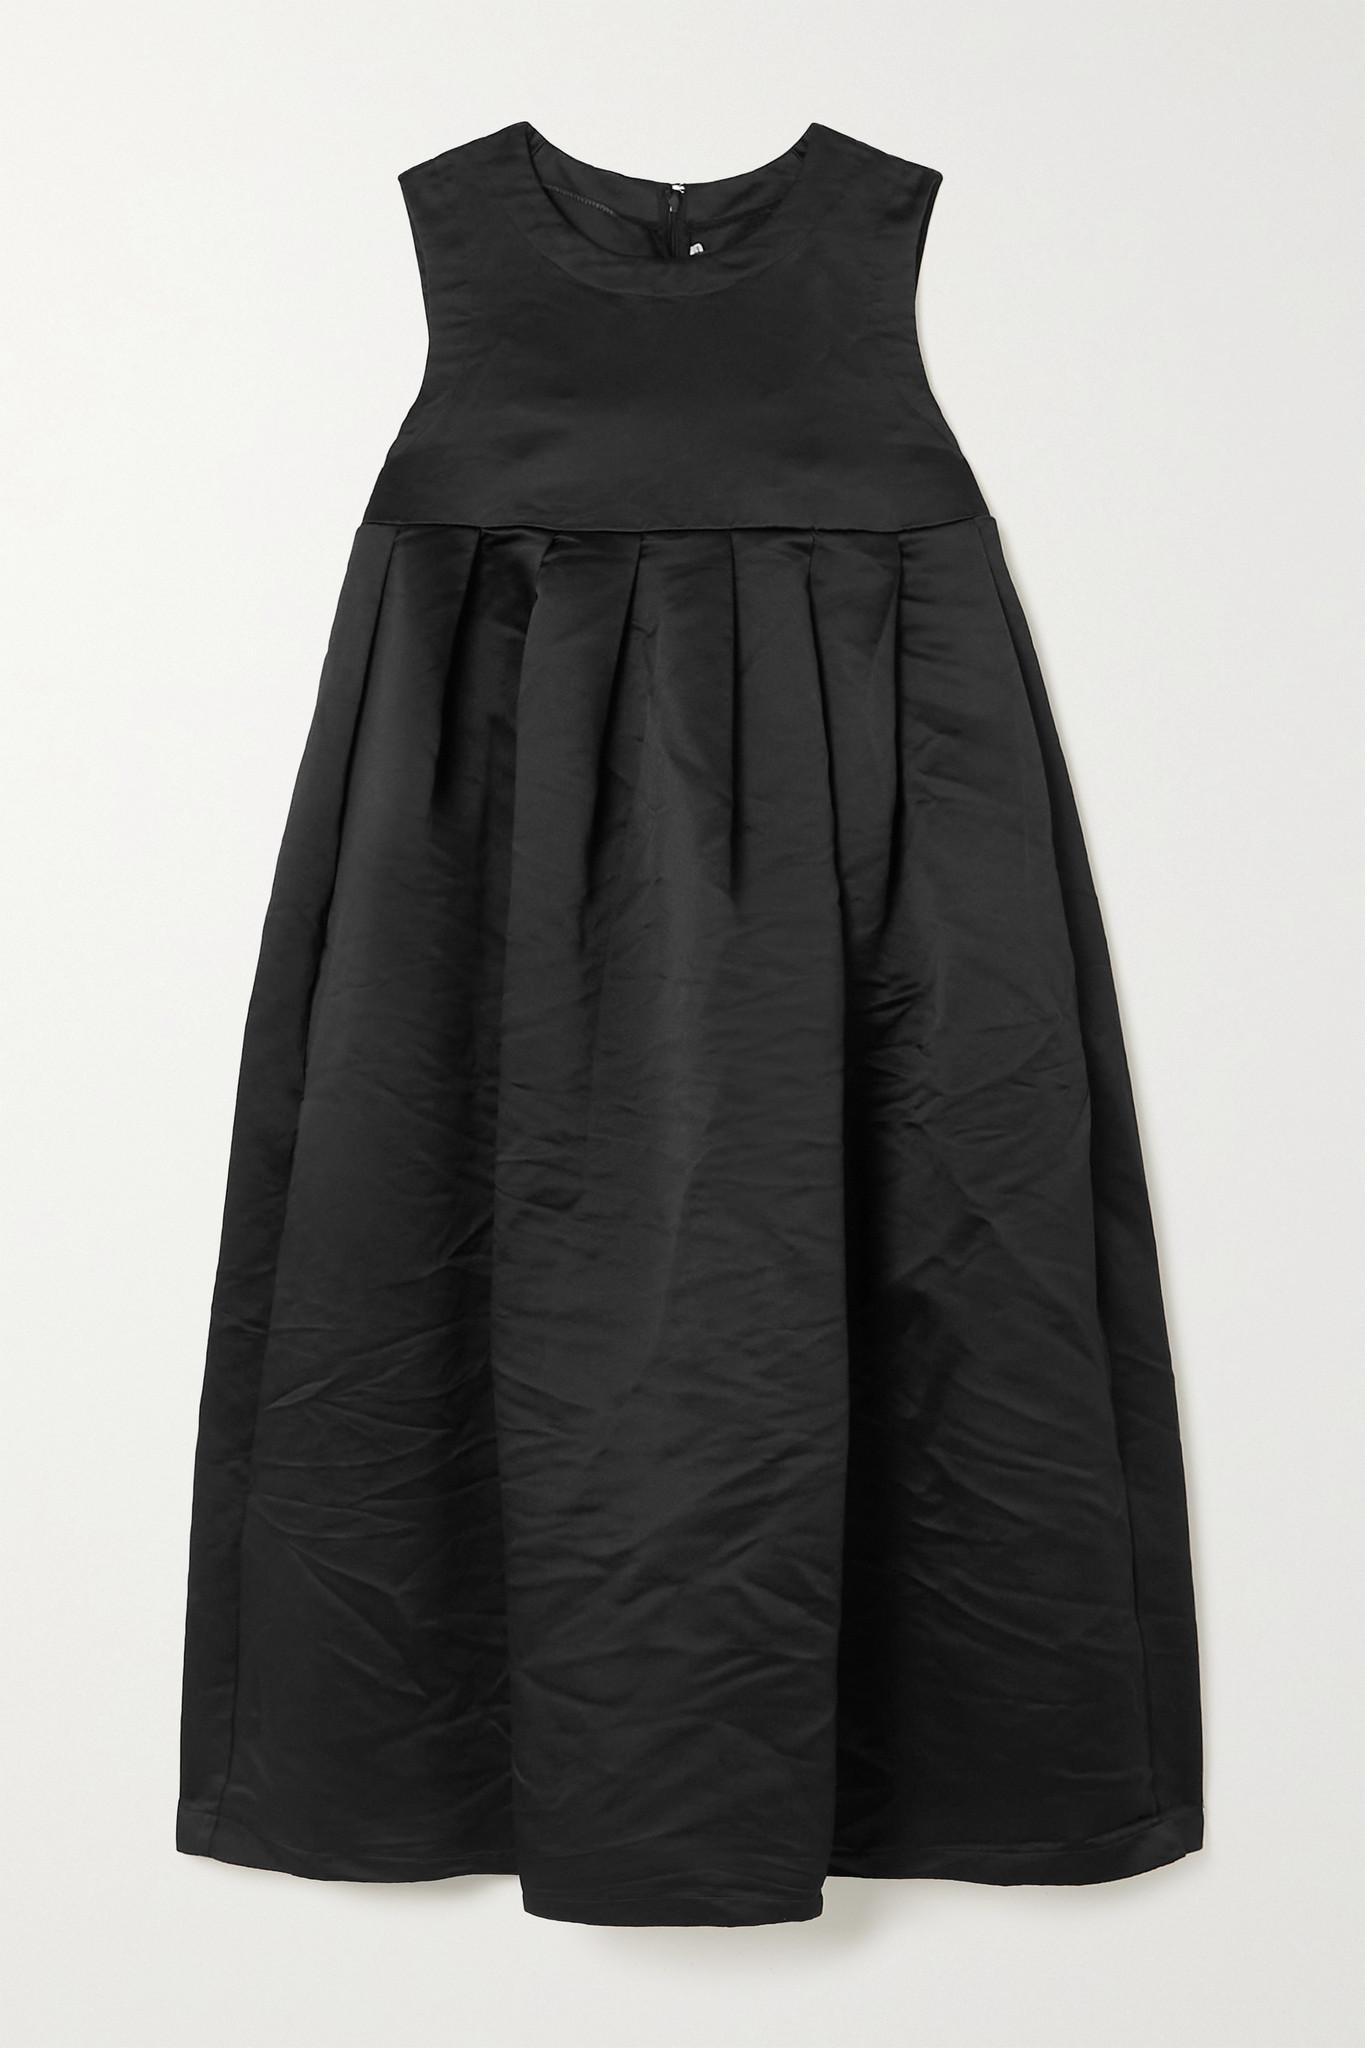 COMME DES GARÇONS GIRL - 褶裥褶皱缎布中长连衣裙 - 黑色 - medium